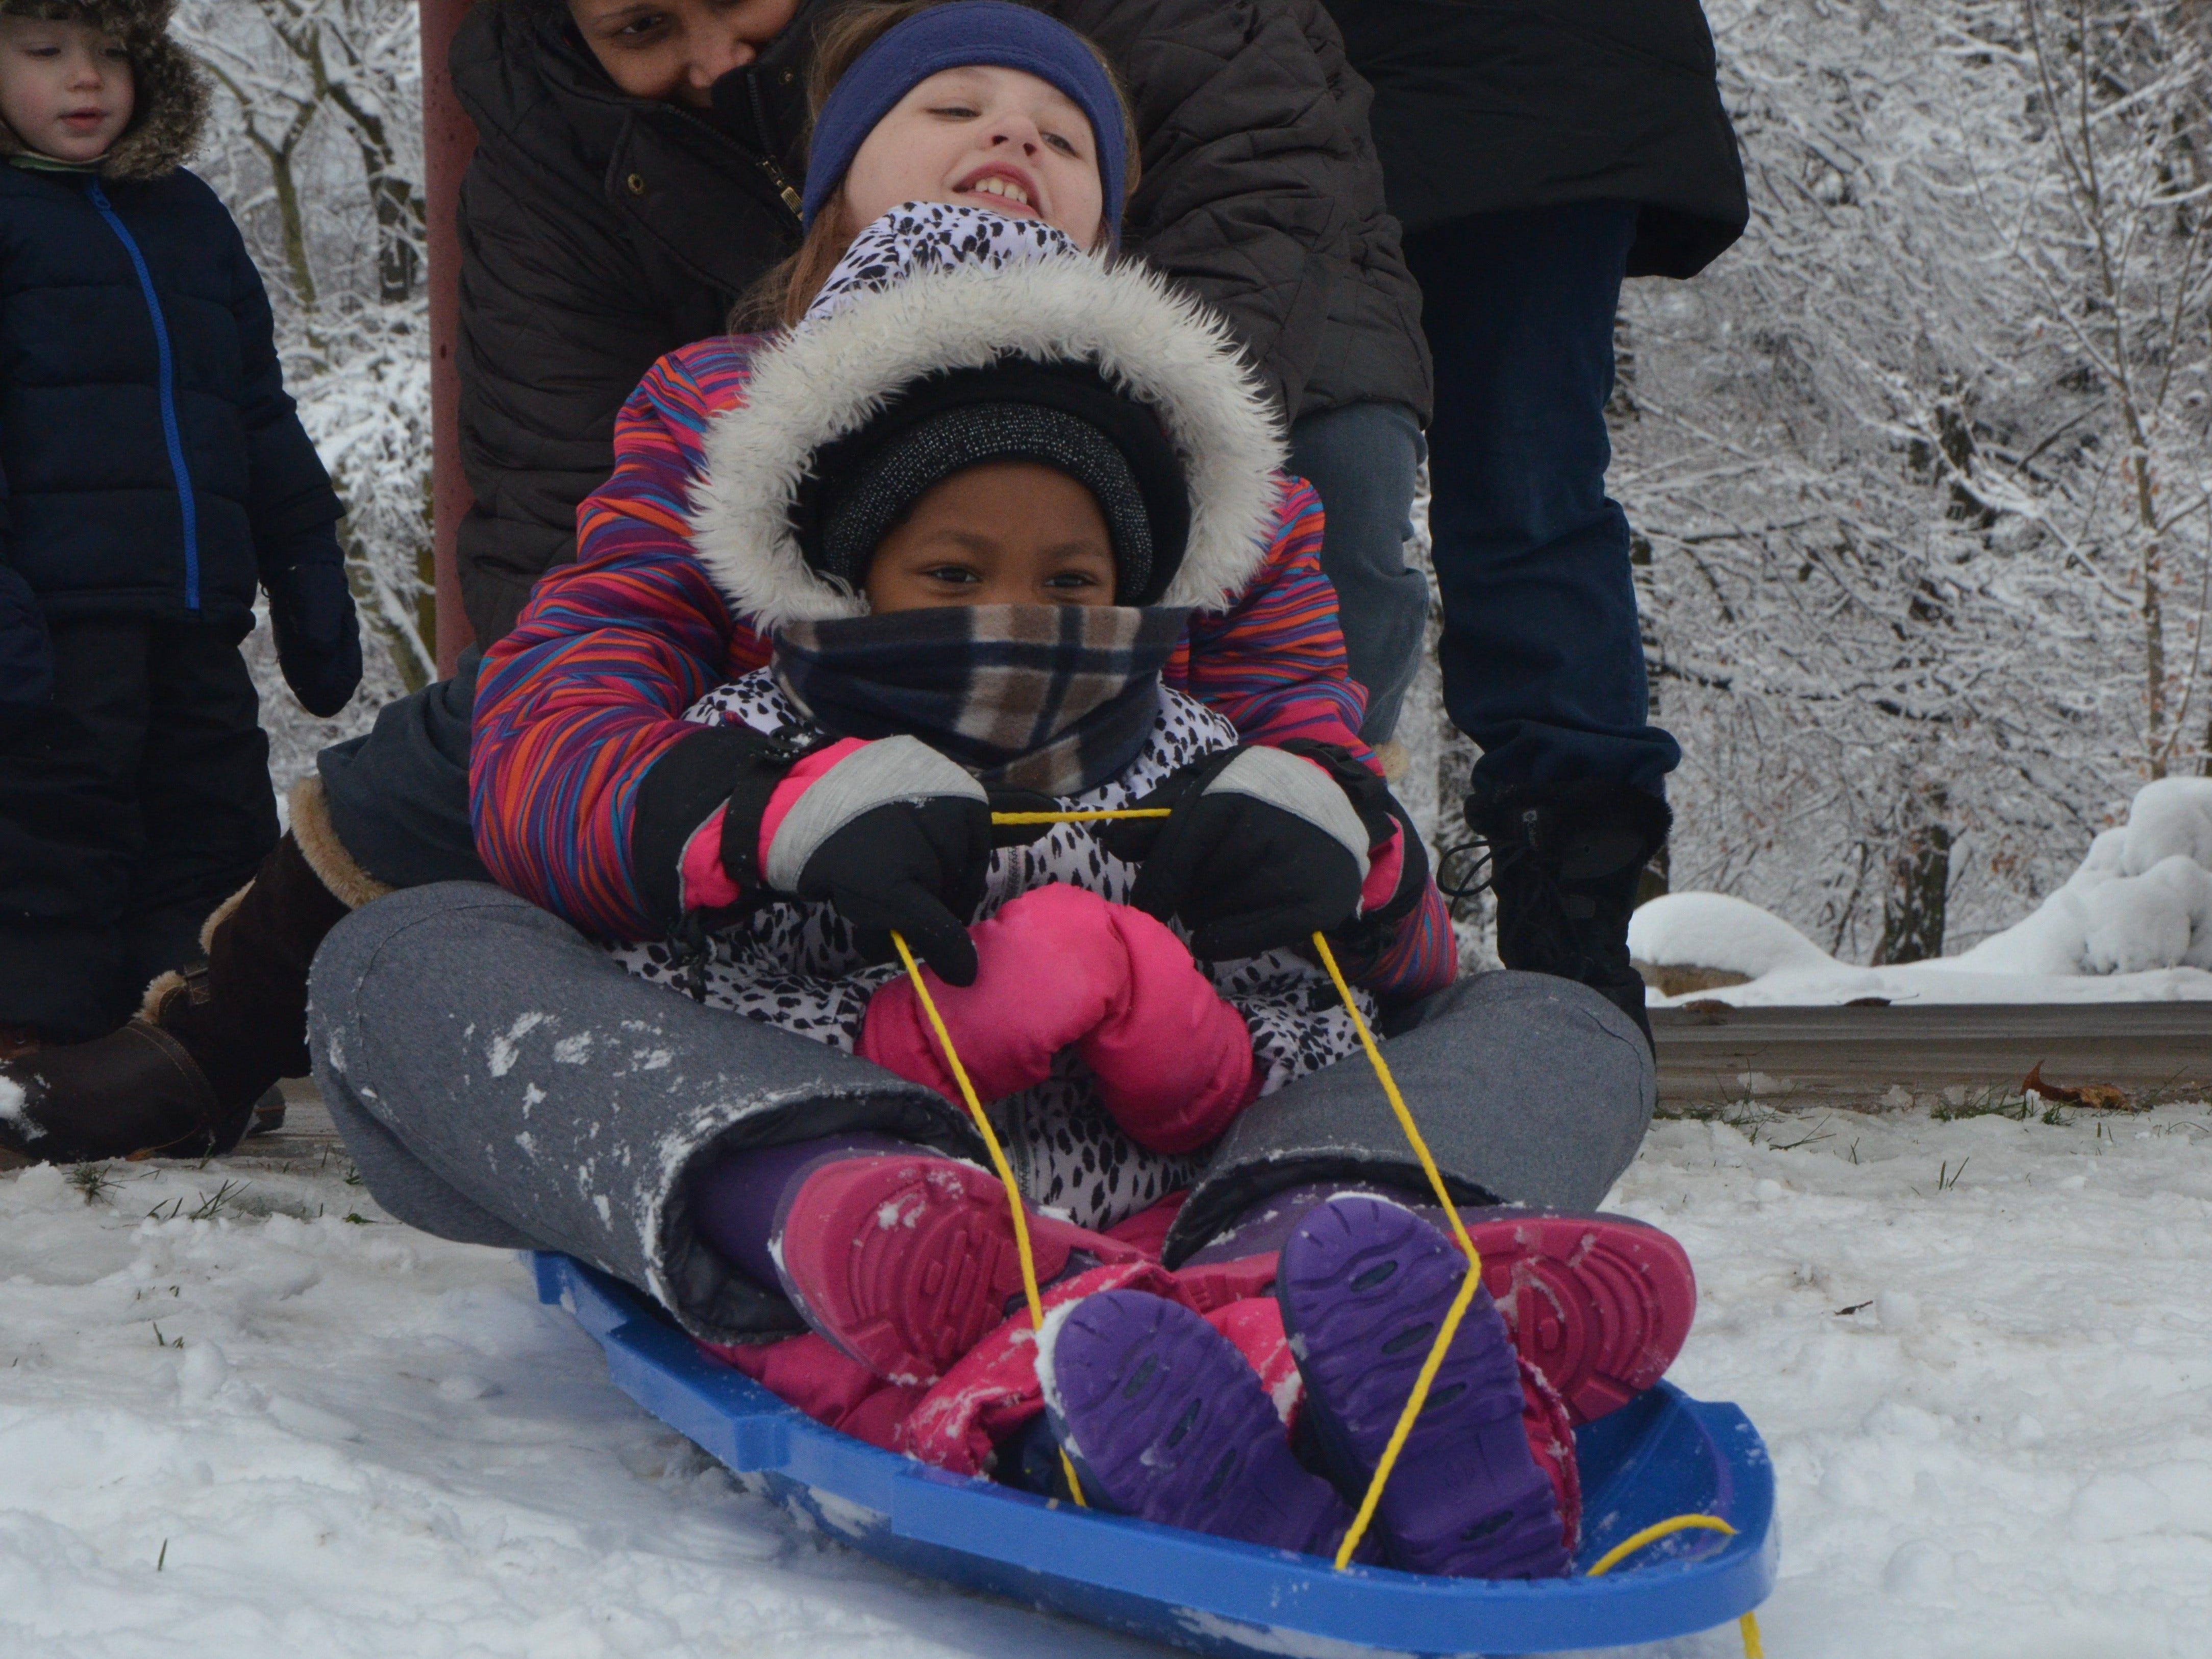 Caron Camburn pushes Alexandria Camburn, 11, and Nadia Craft, 4, down the hill at Leila Arboretum on Monday, November 26, 2018.